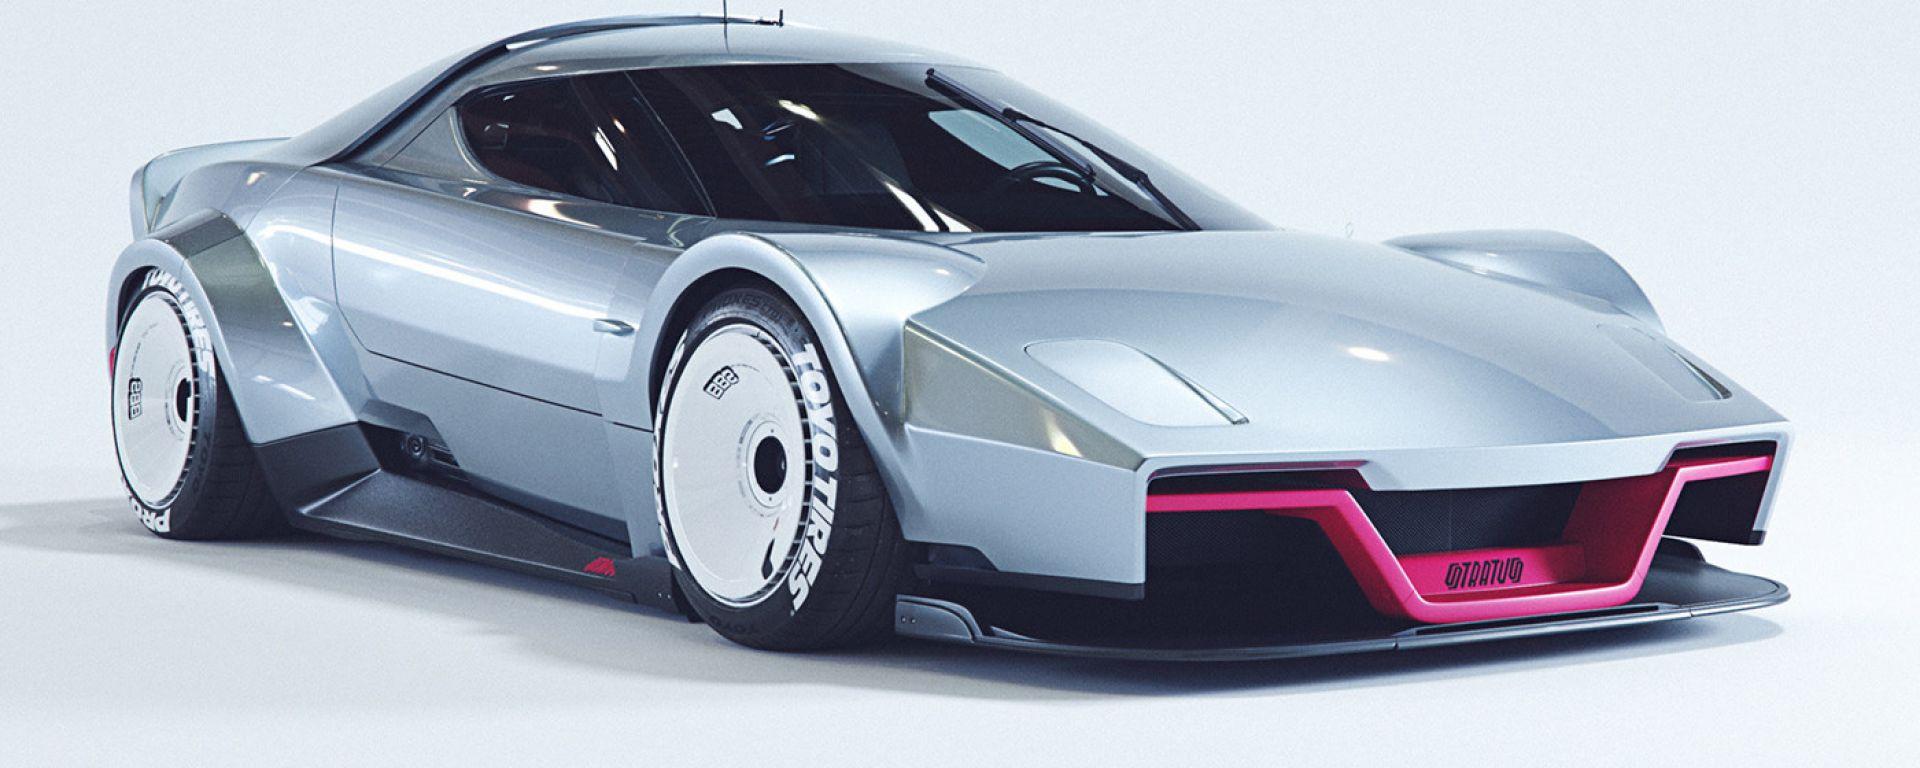 La Lancia Stratus 2025 di Carlos Pecino Albornoz